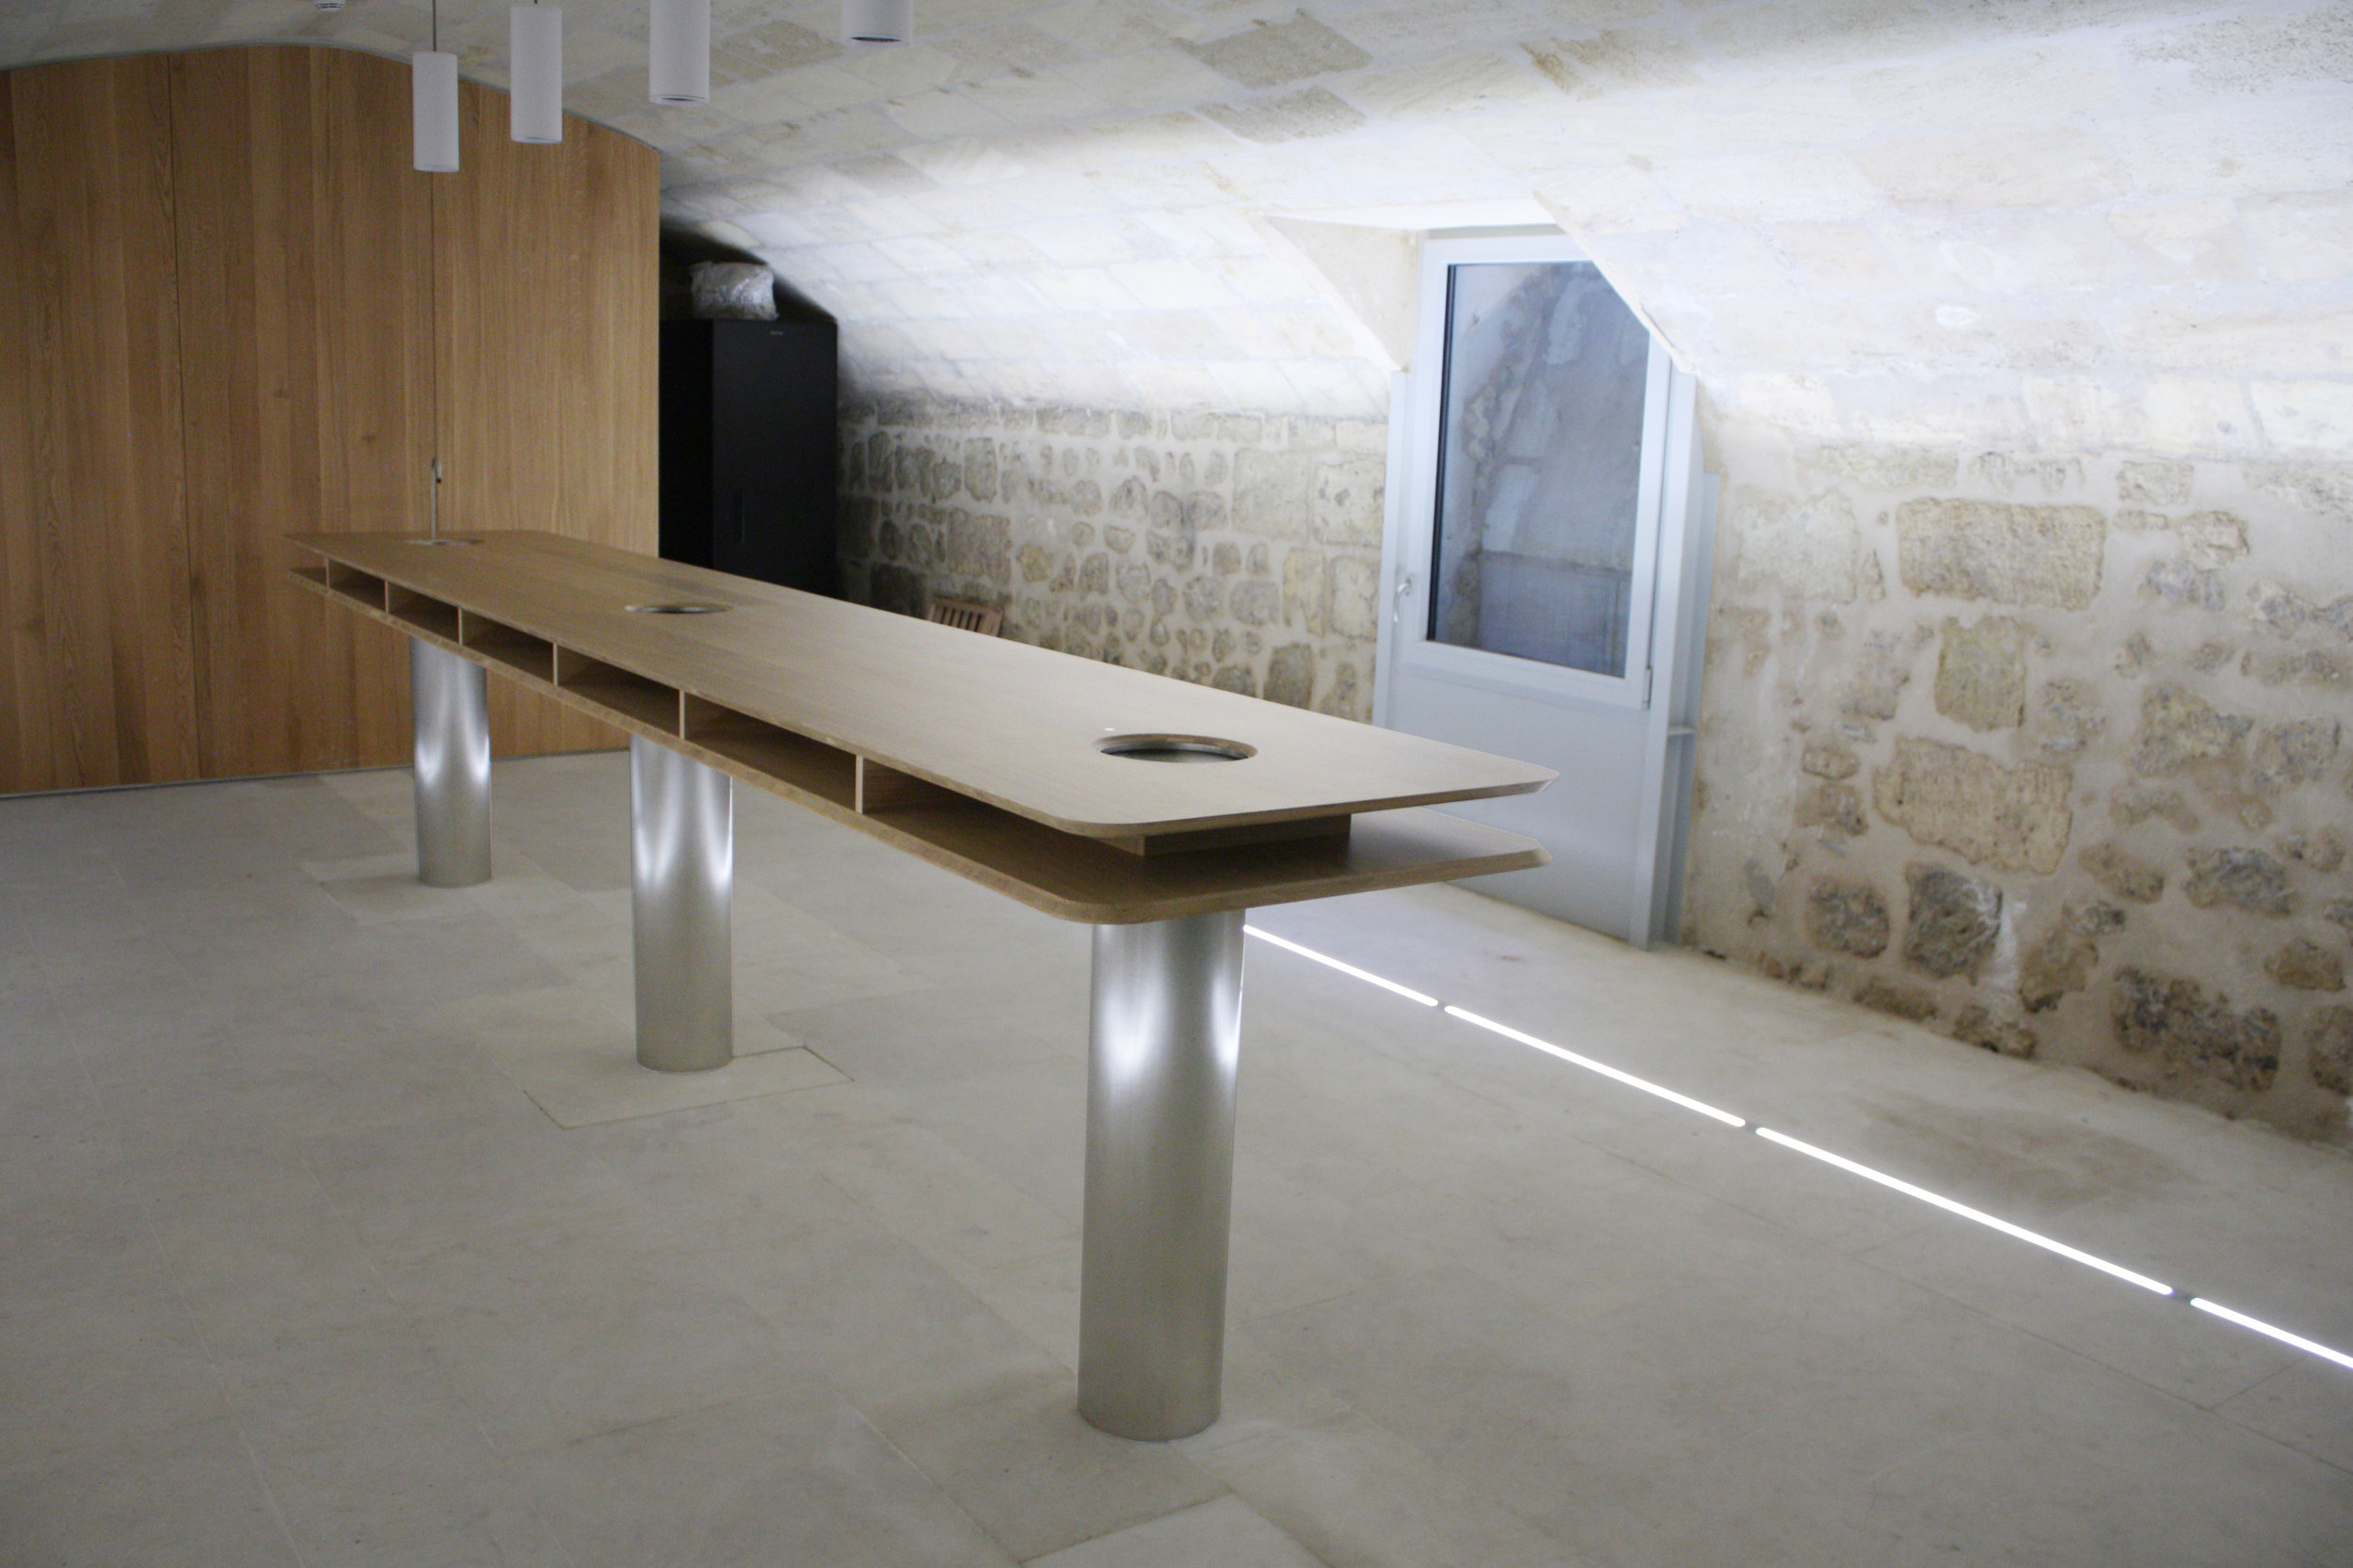 CecileBarani_tabledegustation_design_12.JPG